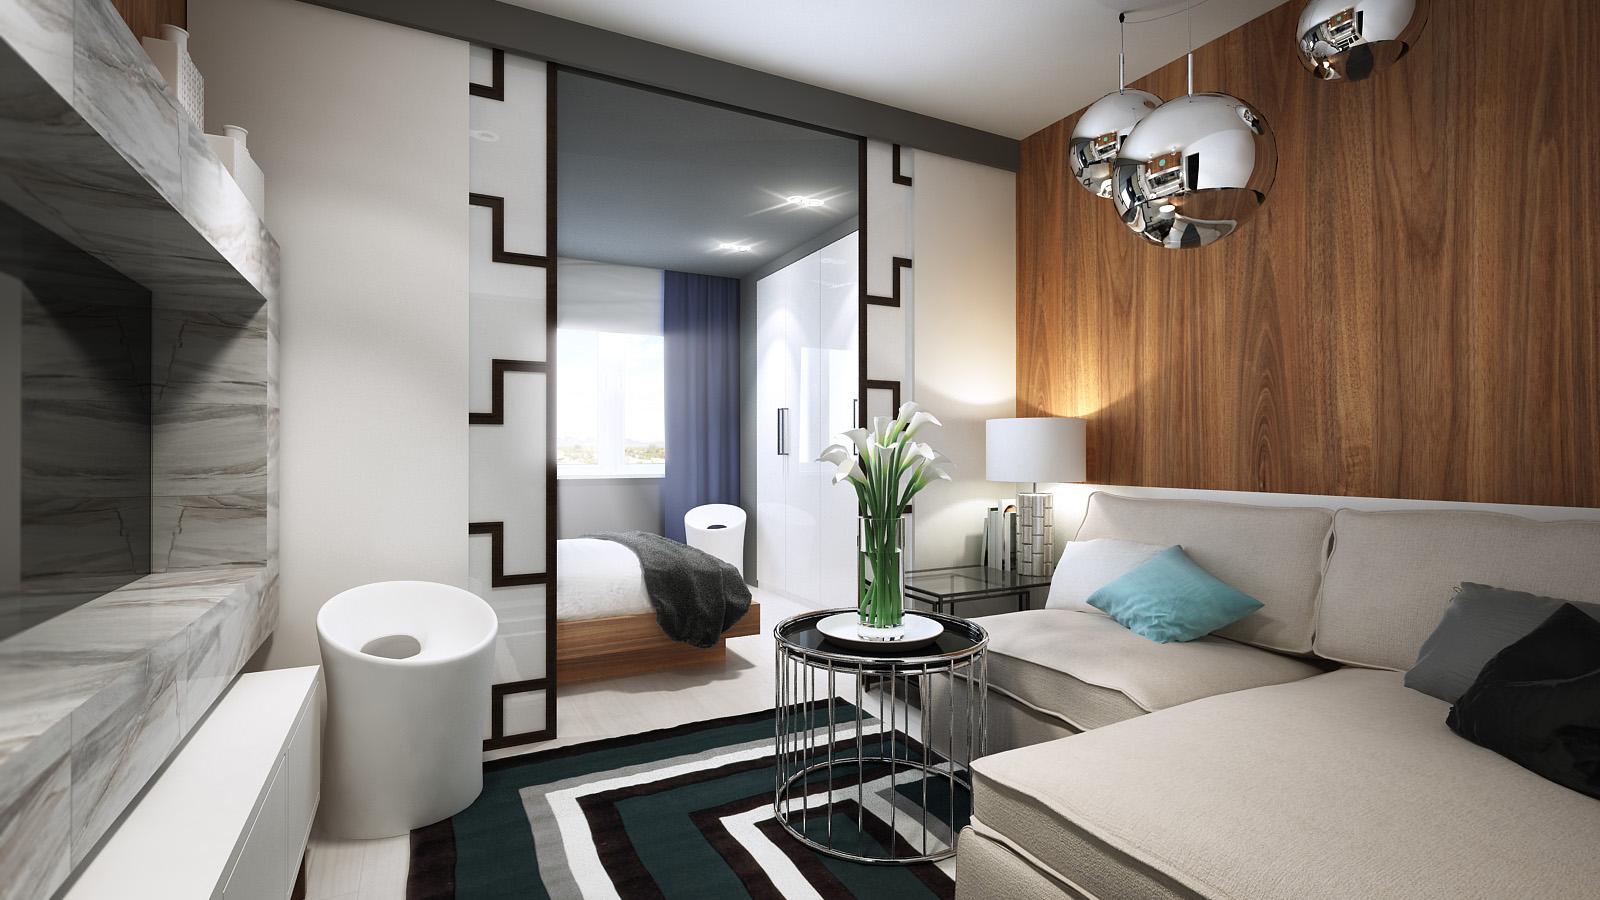 Дизайн комнаты гостиная спальня